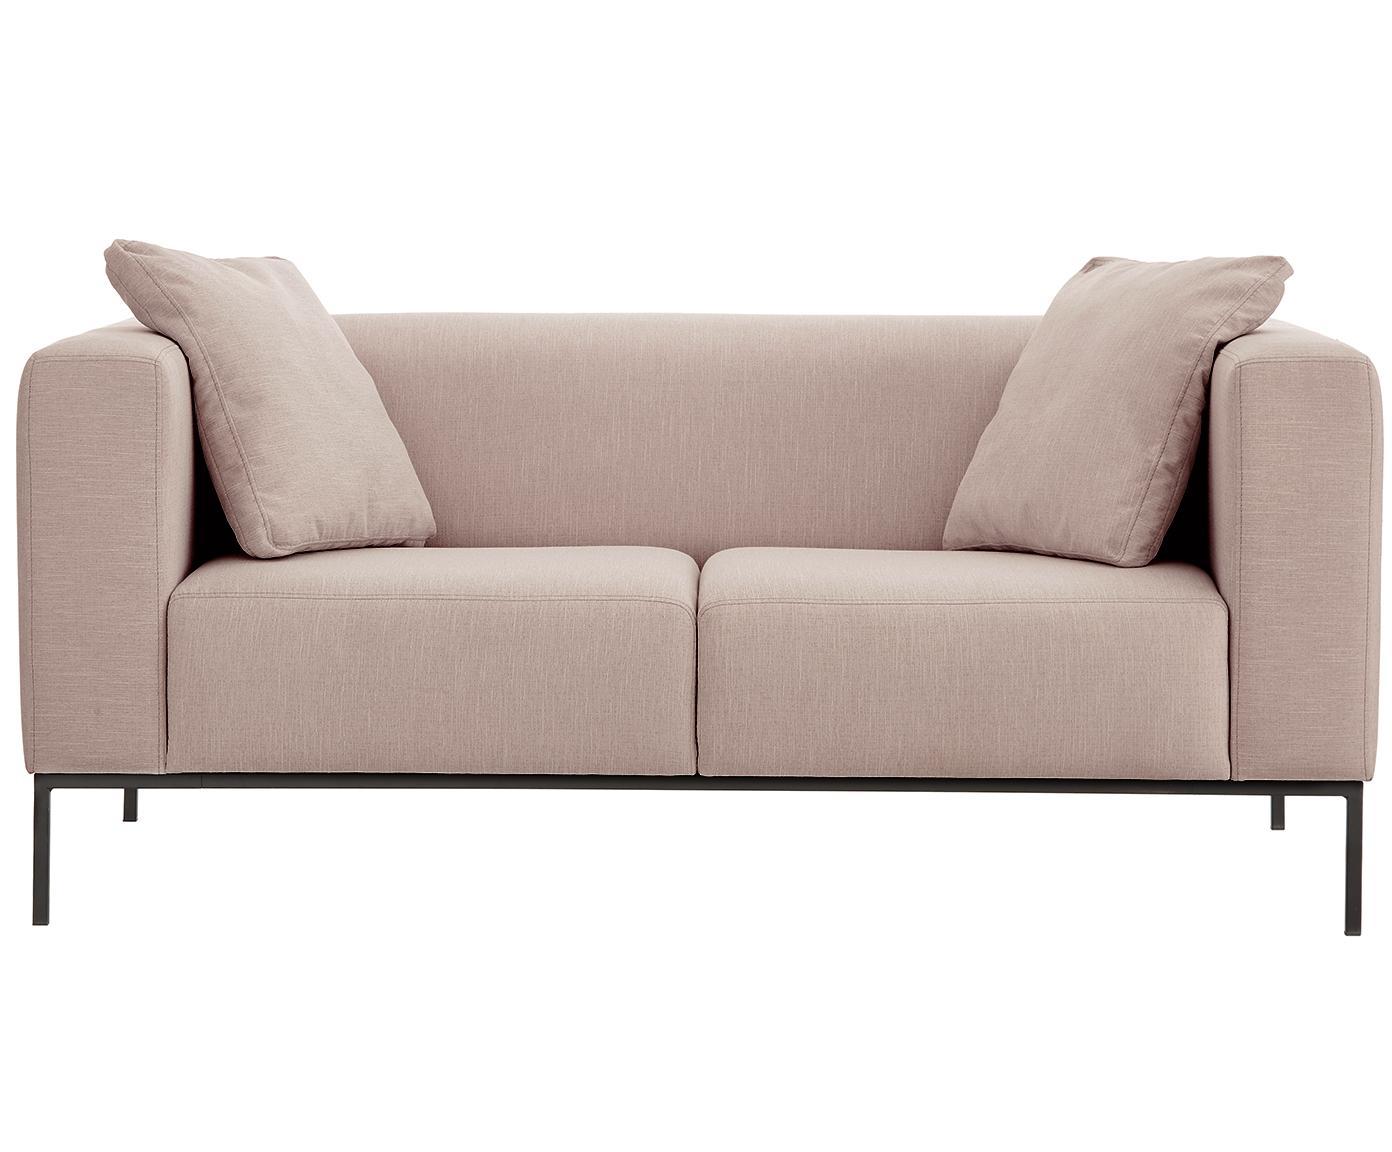 Sofa Carrie (2-Sitzer), Bezug: Polyester 50.000 Scheuert, Gestell: Spanholz, Hartfaserplatte, Webstoff Altrosa, B 176 x T 86 cm